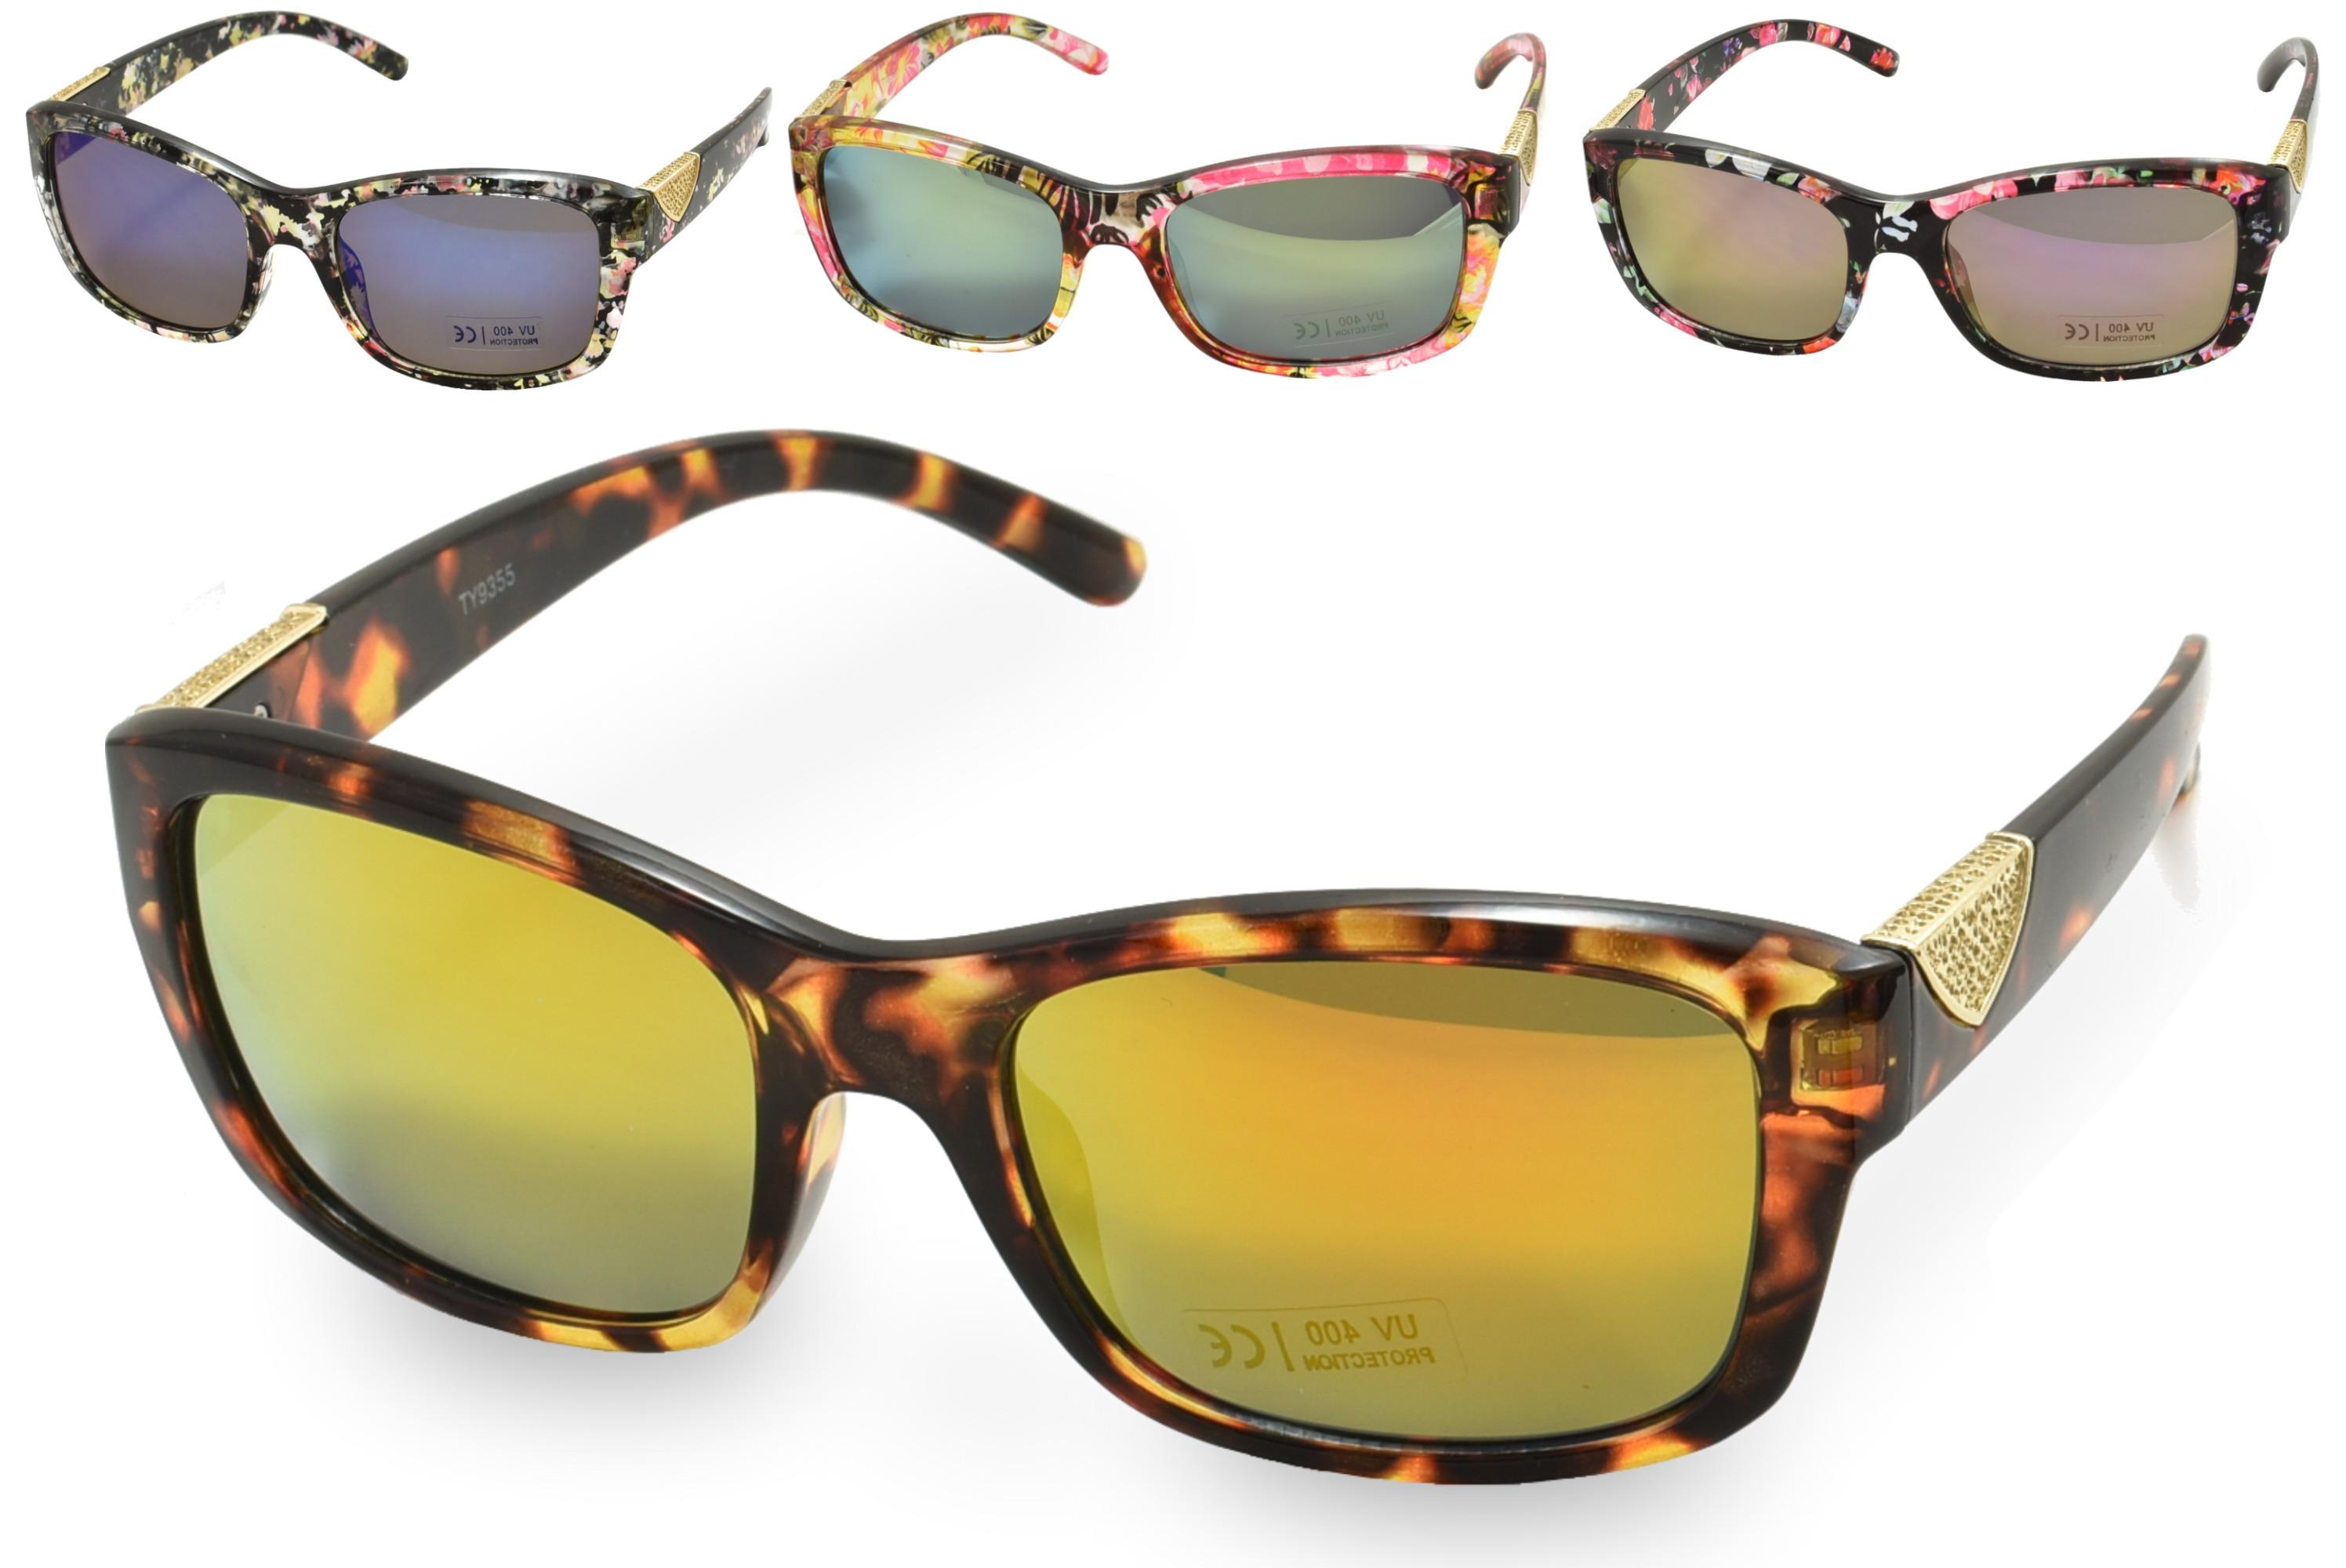 Ladies Plastic Printed Frame Sunglasses - 4 Assorted